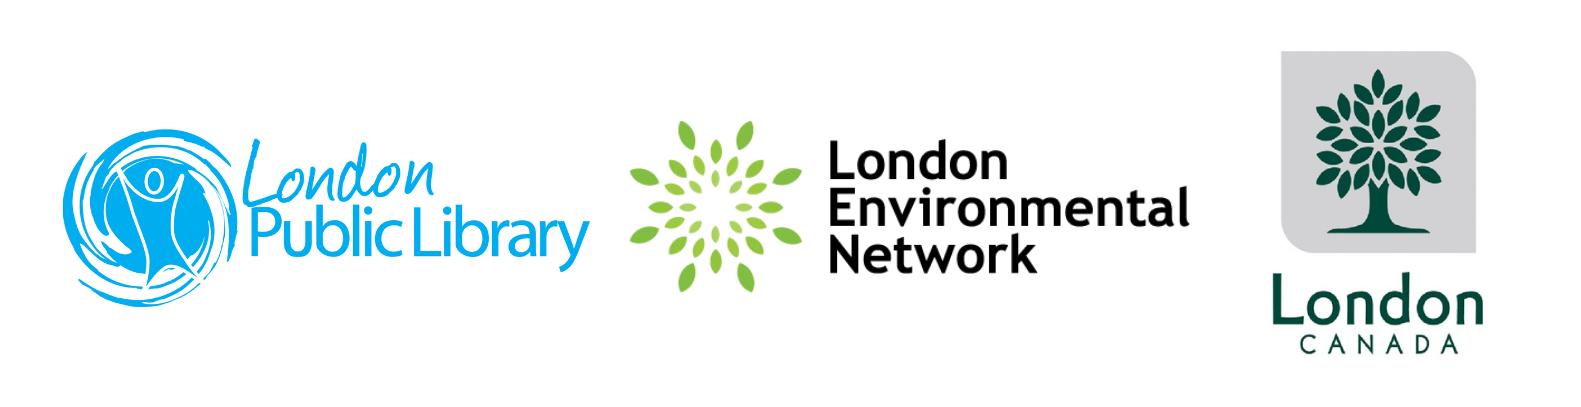 London Public Library, London Environmental Network, and City of London logos